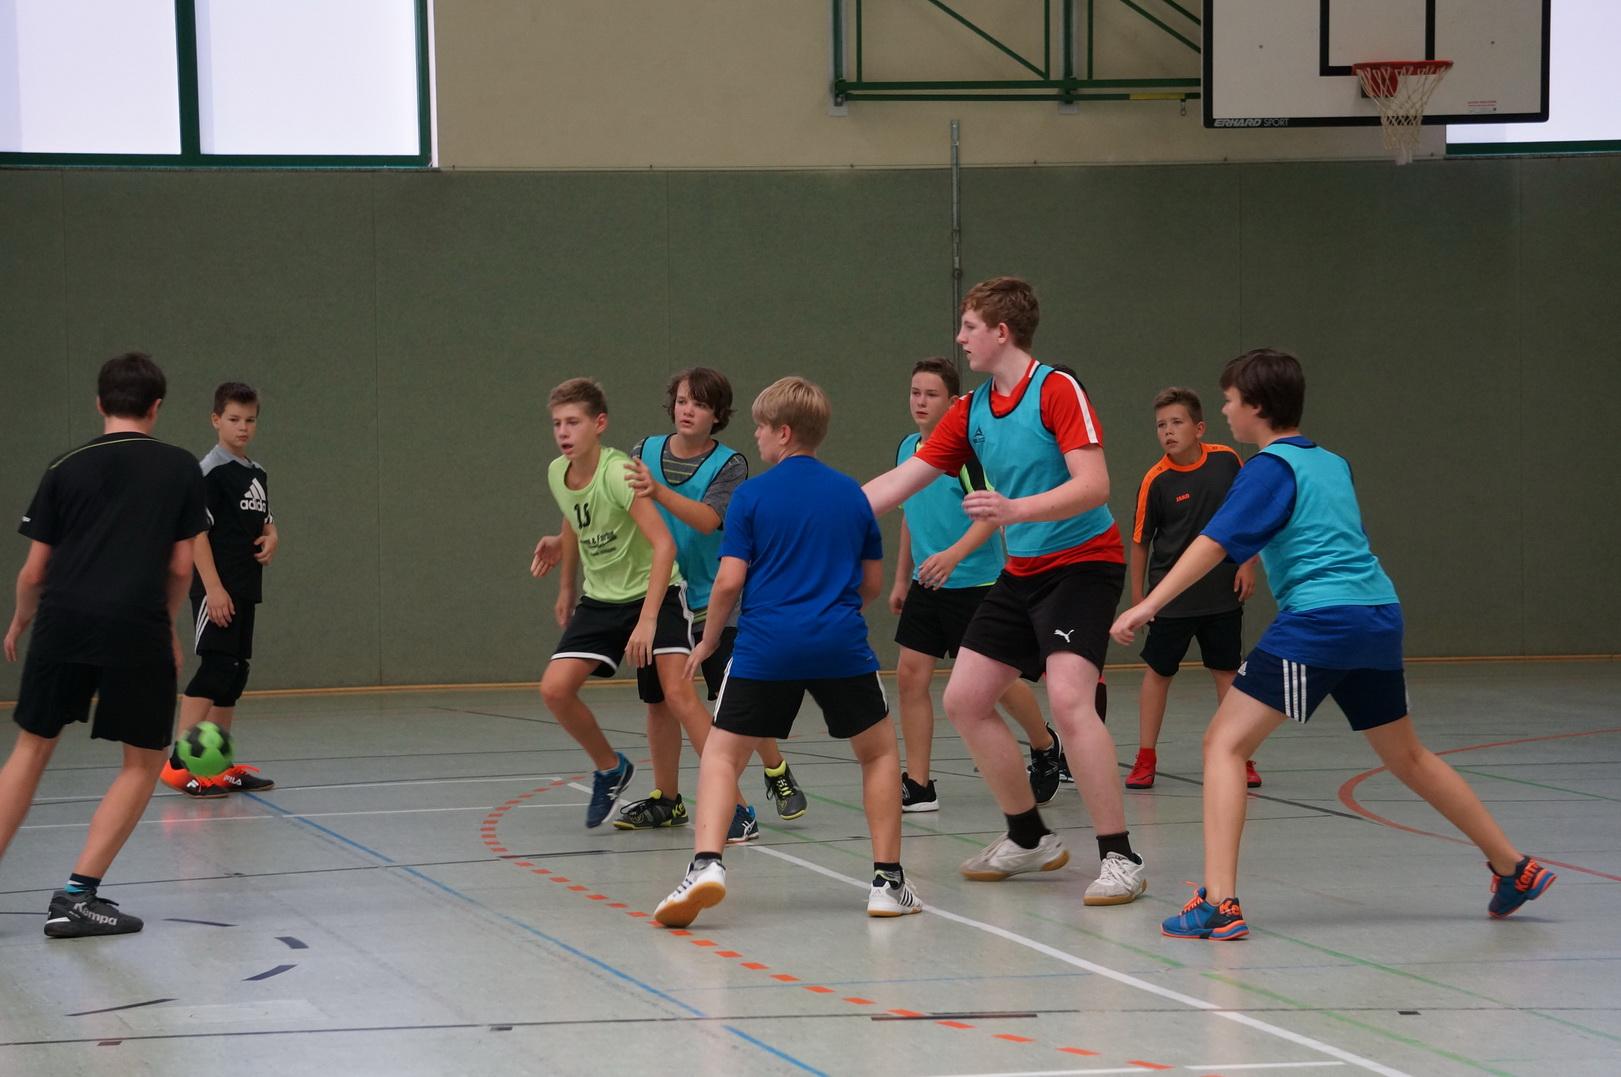 201808_Handballcamp_SDH_MG_104w